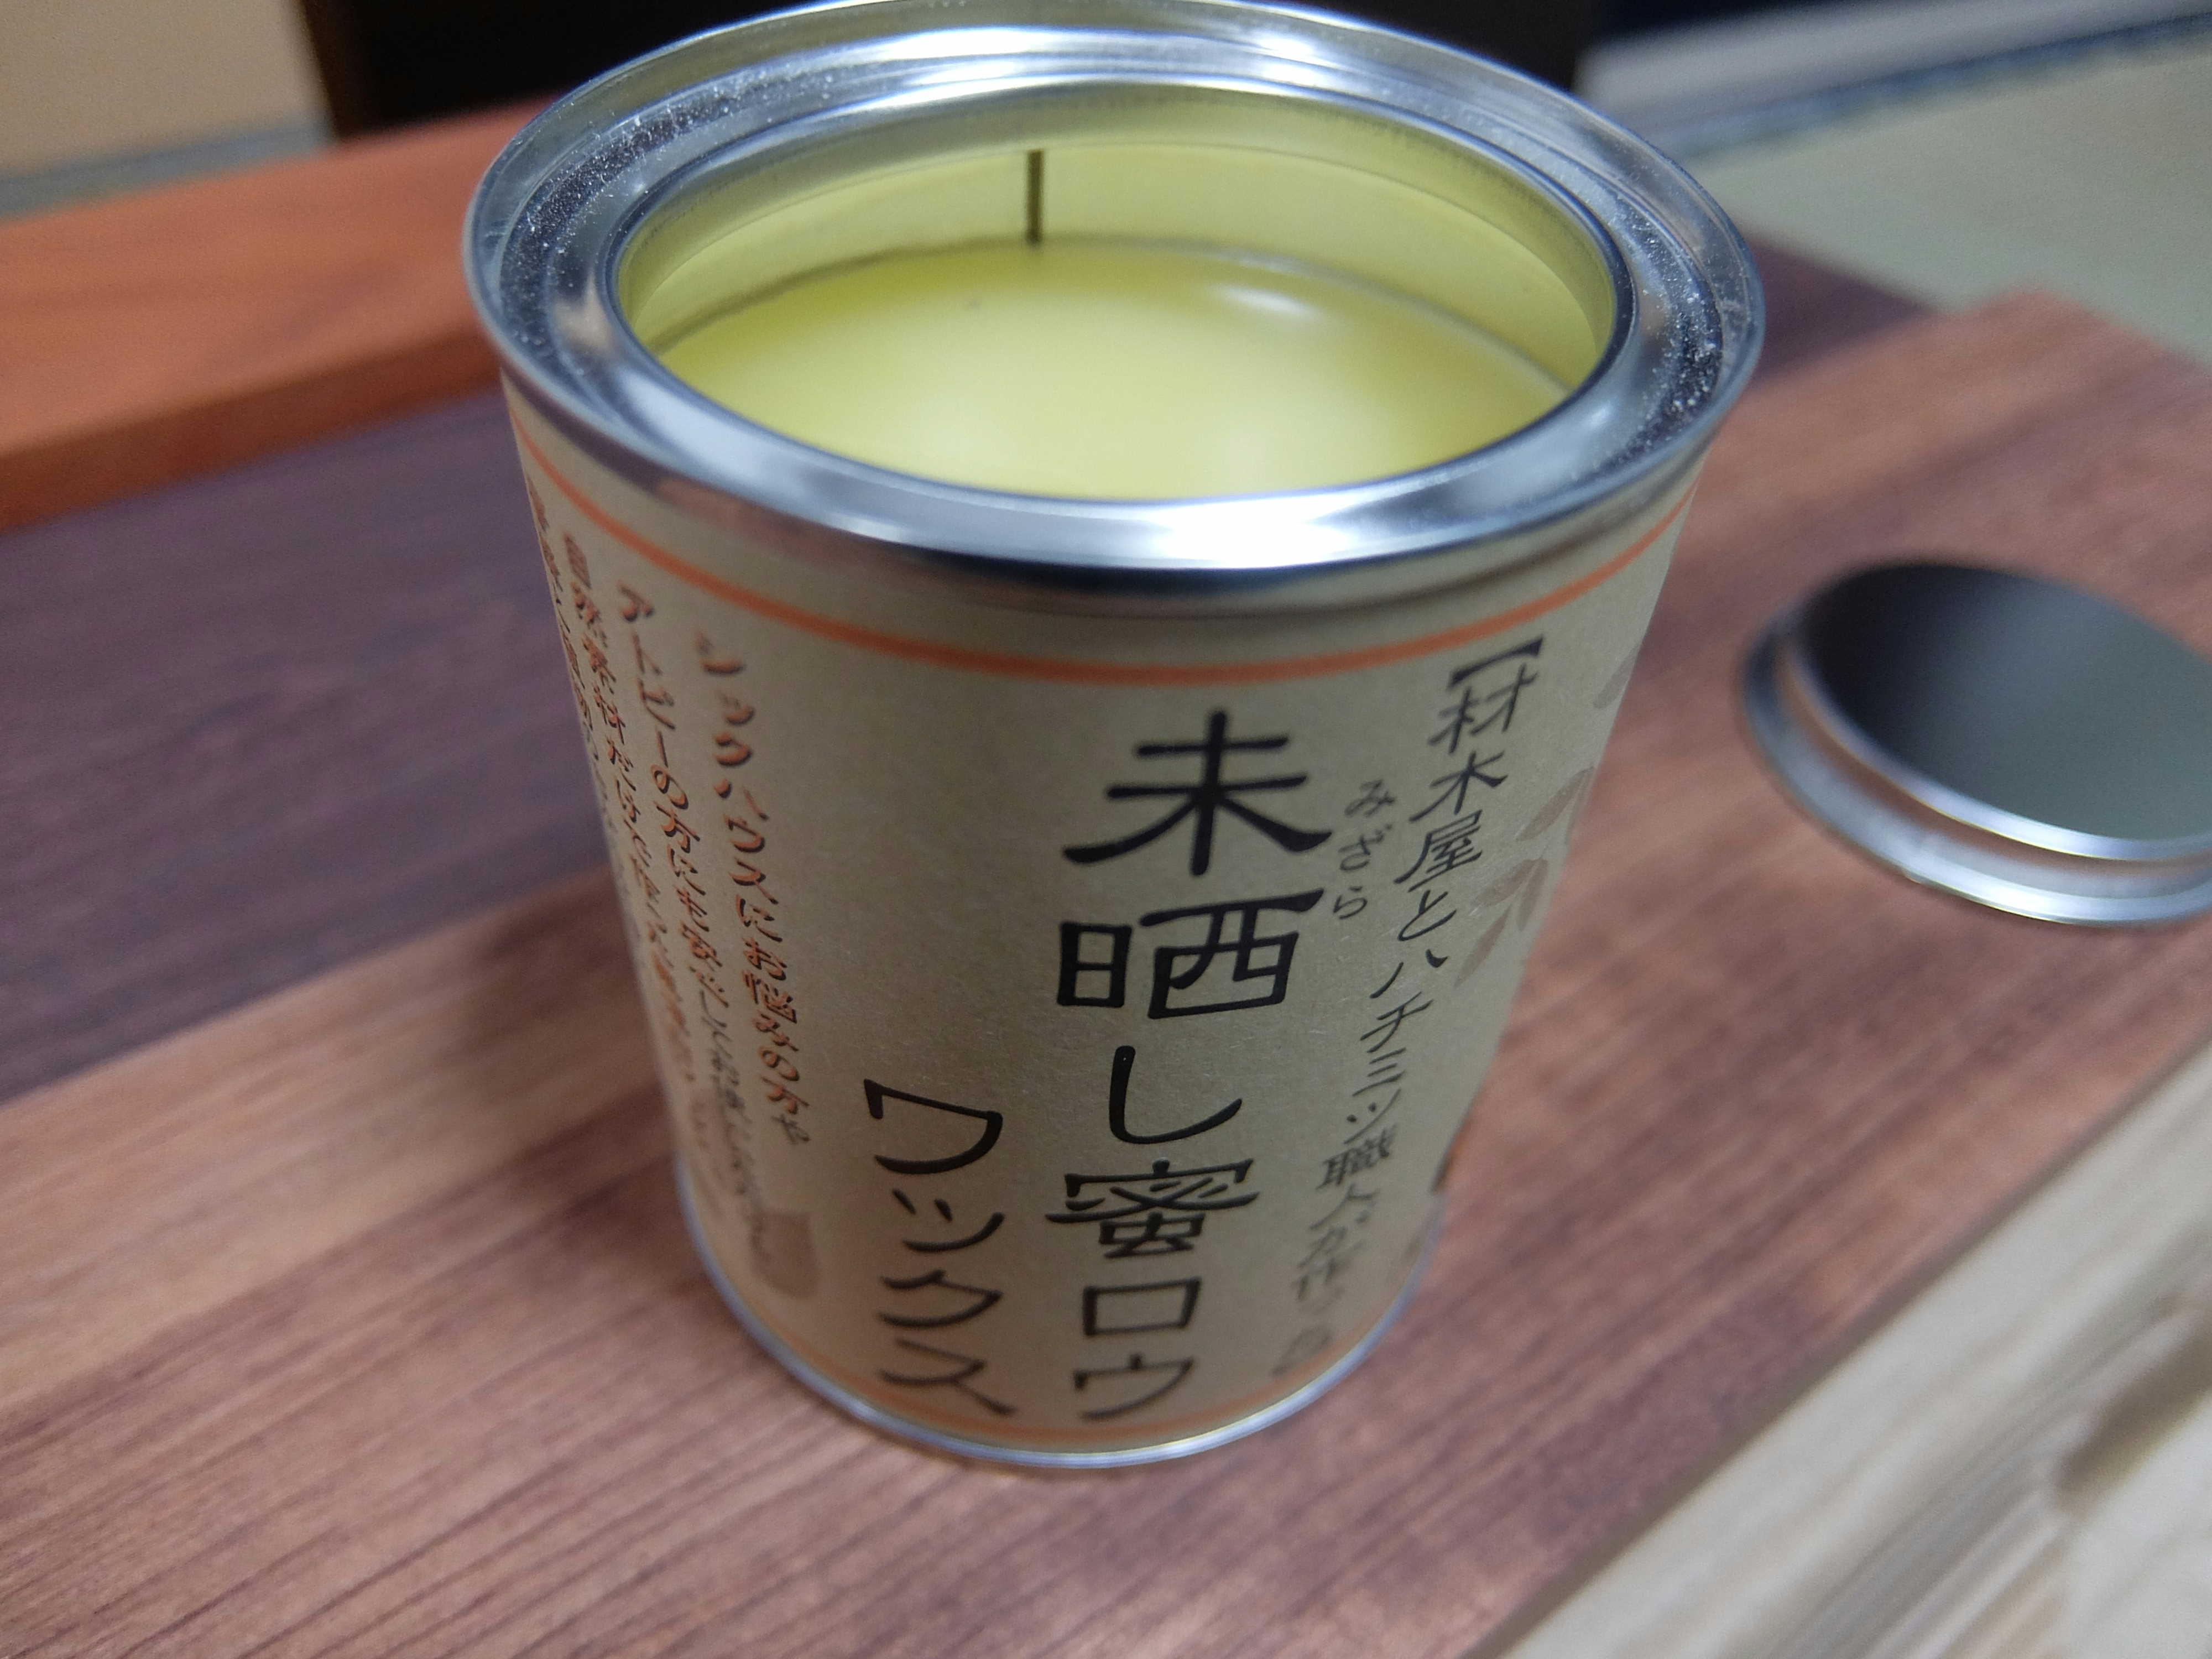 mitsuroh-wax